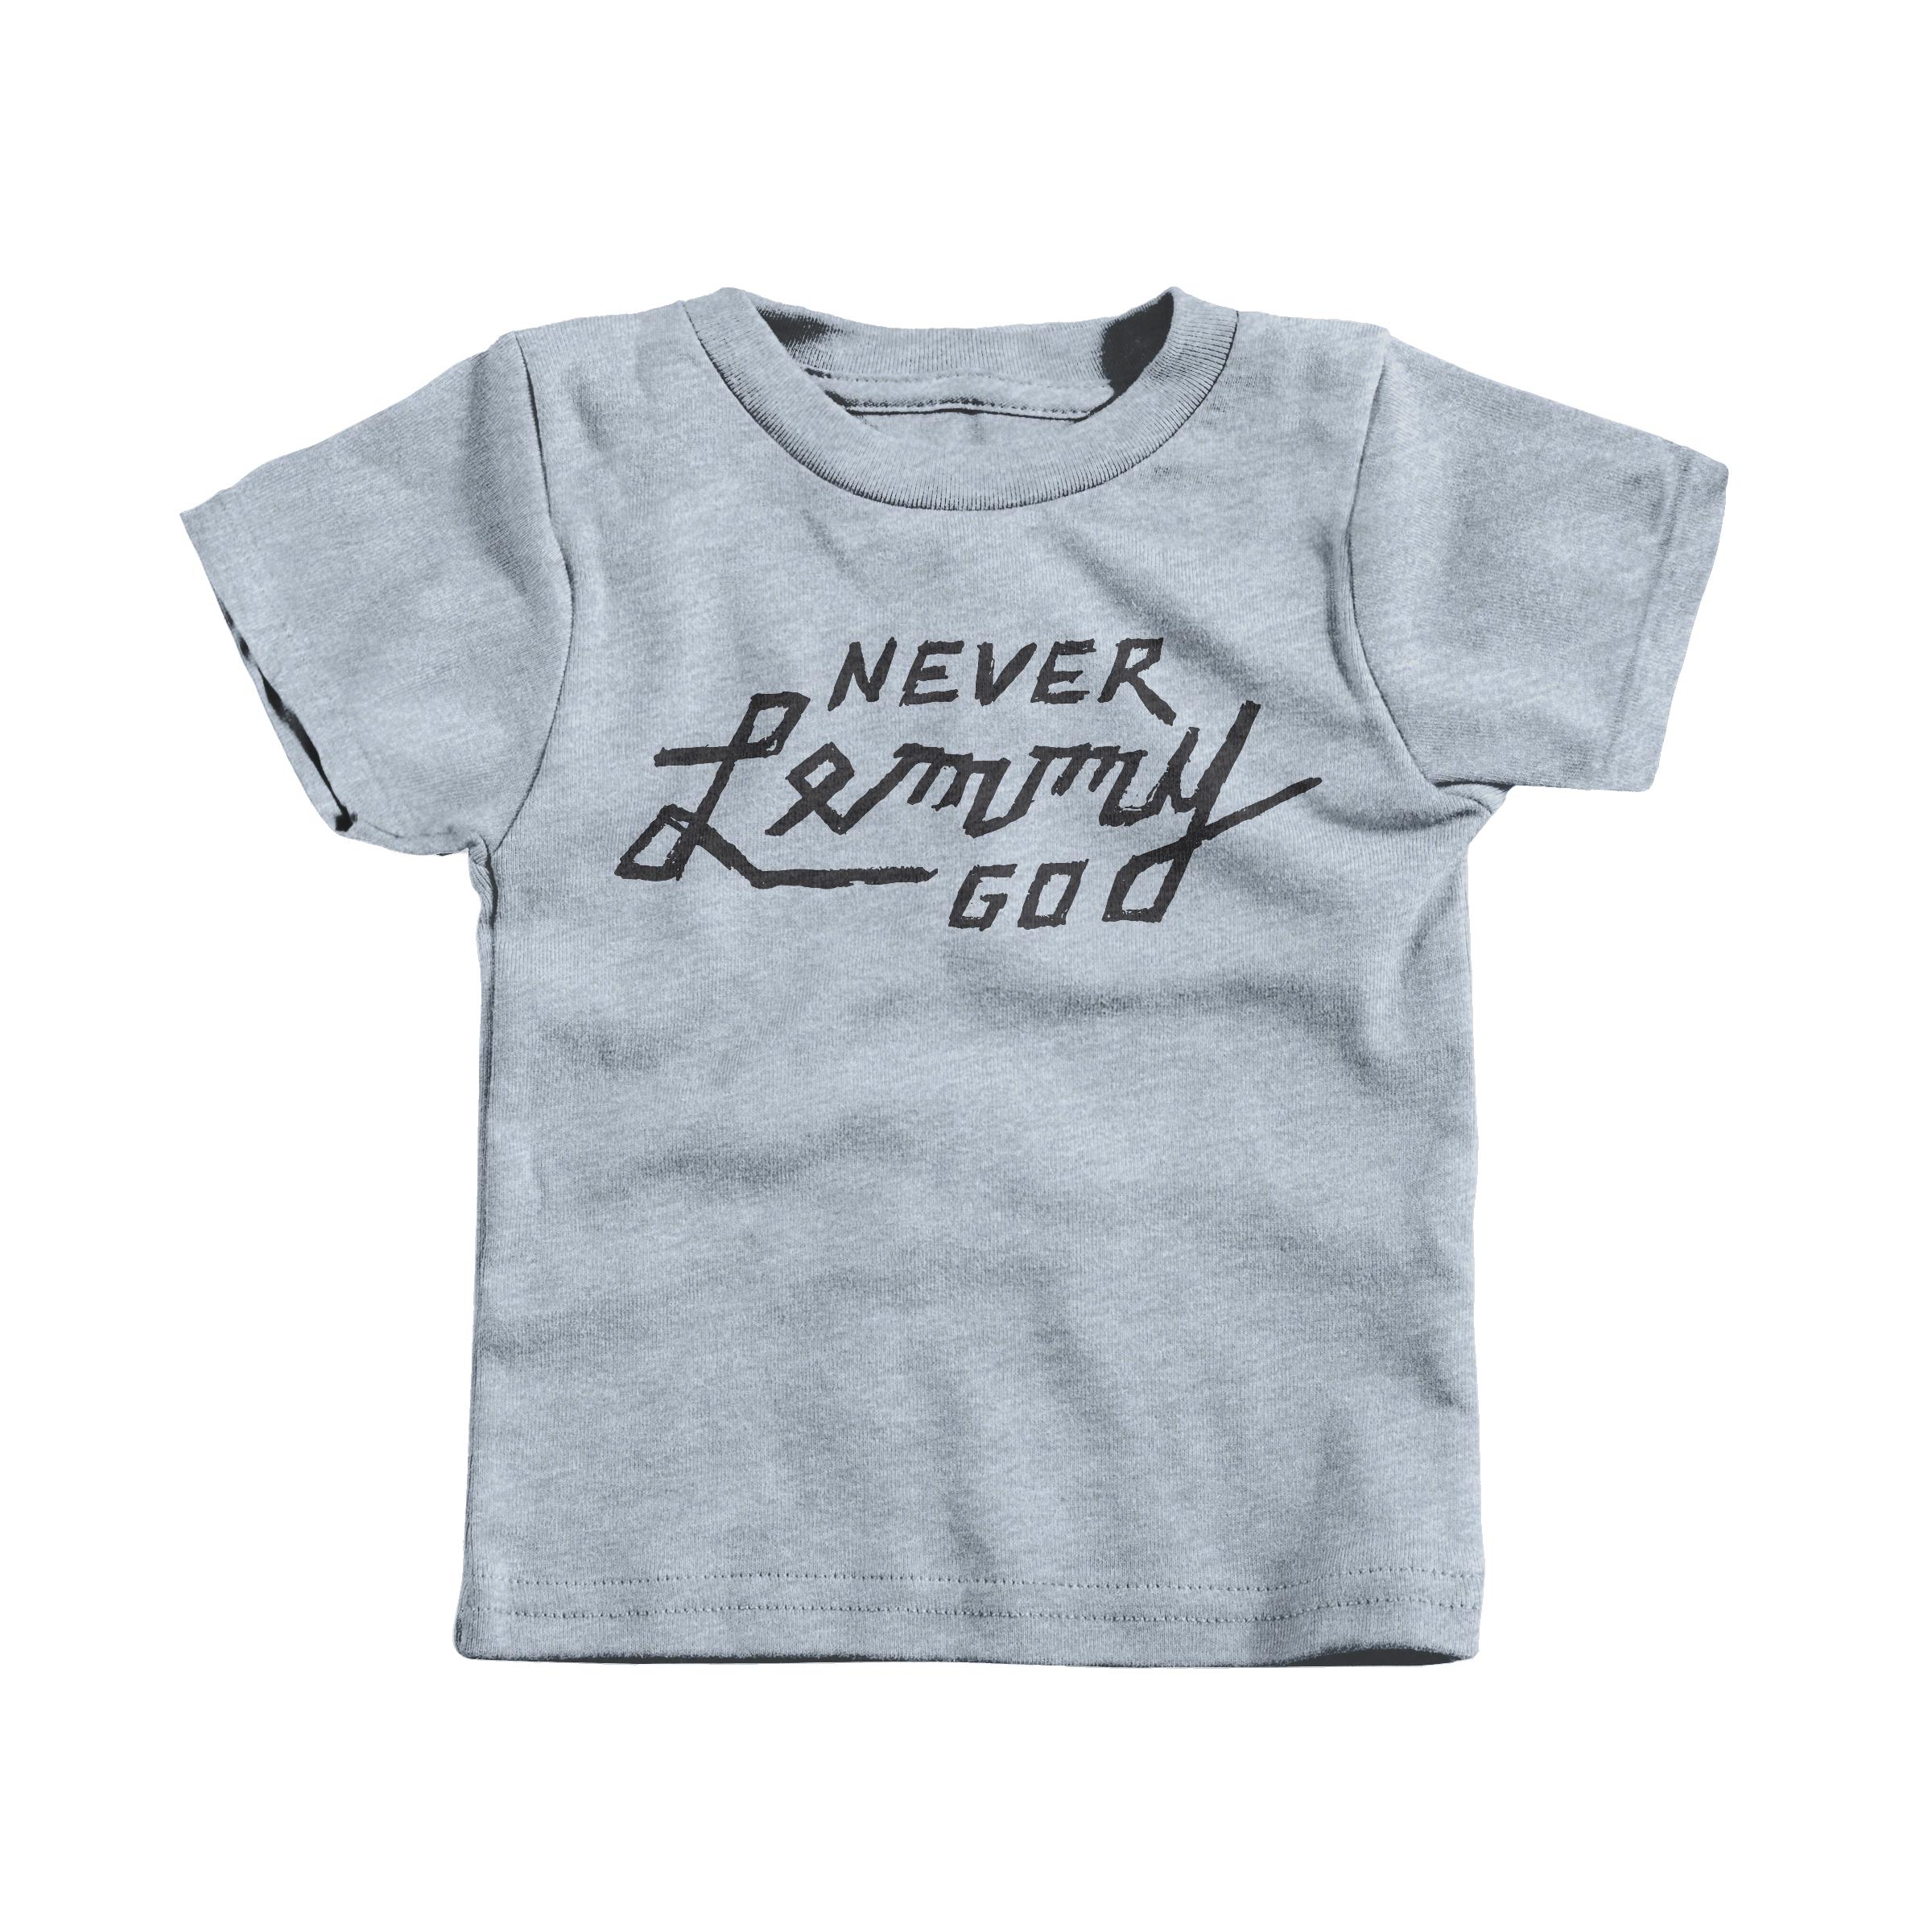 NEVER LEMMY GO Heather Grey (T-Shirt)